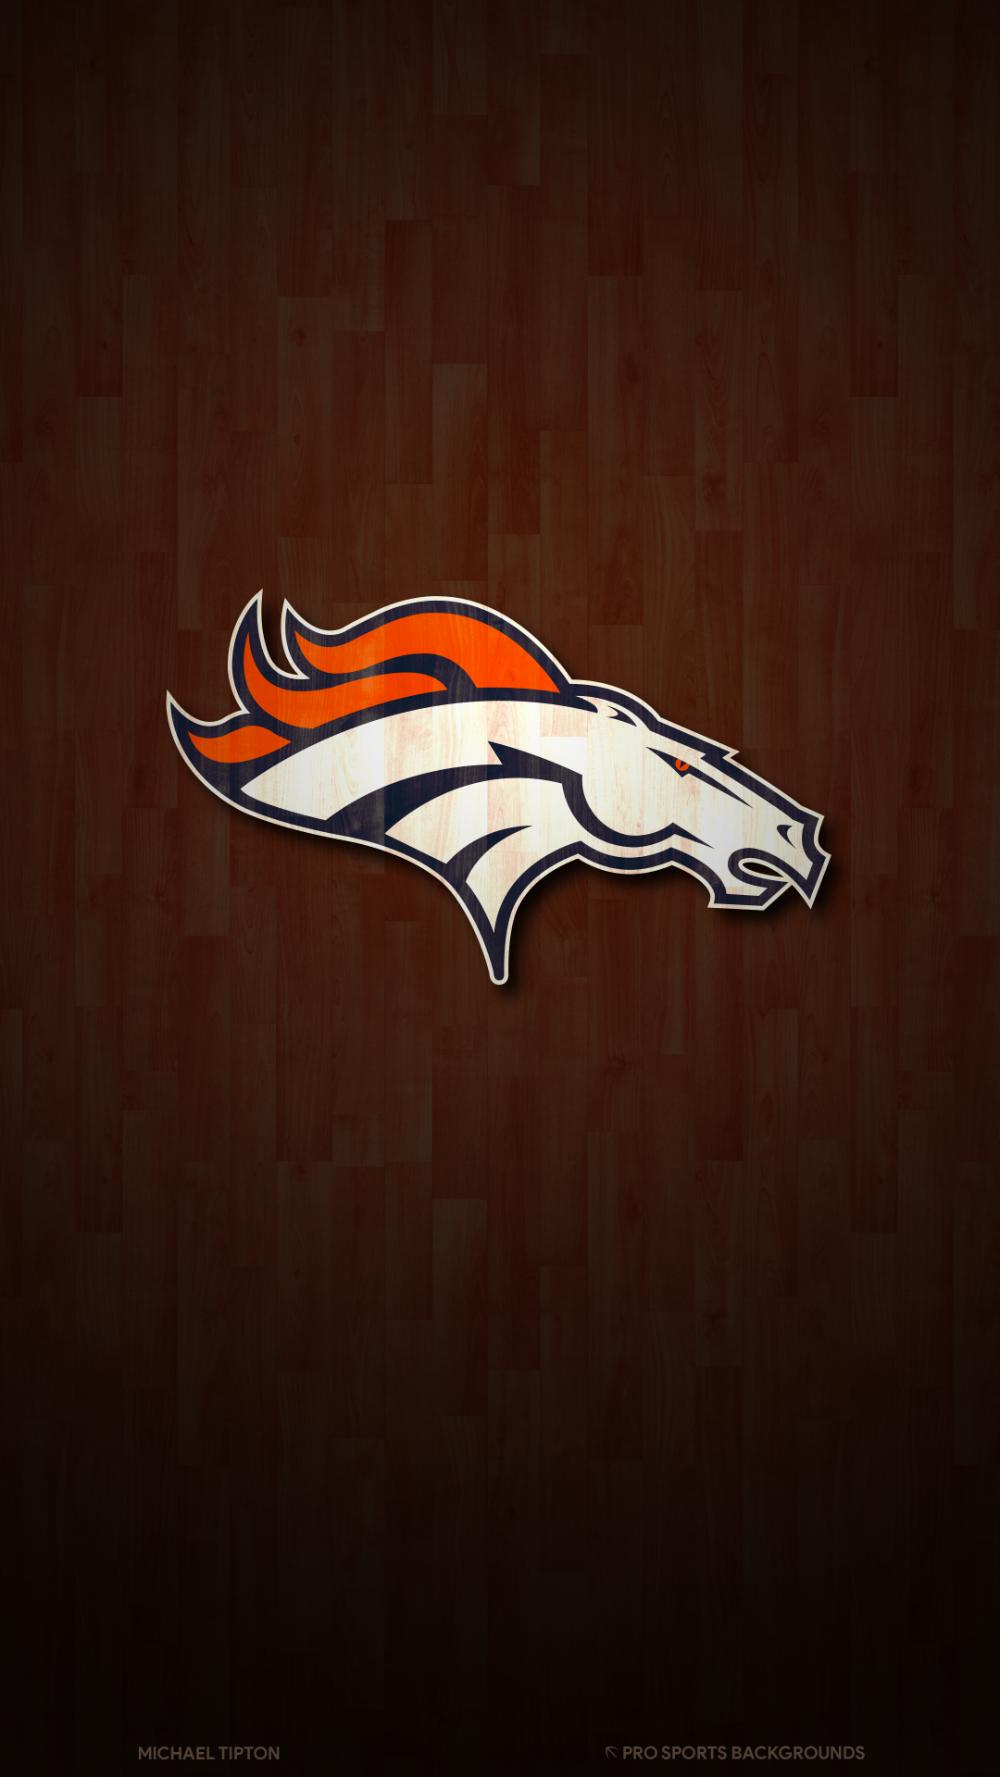 2020 Denver Broncos Wallpapers   Pro Sports Backgrounds